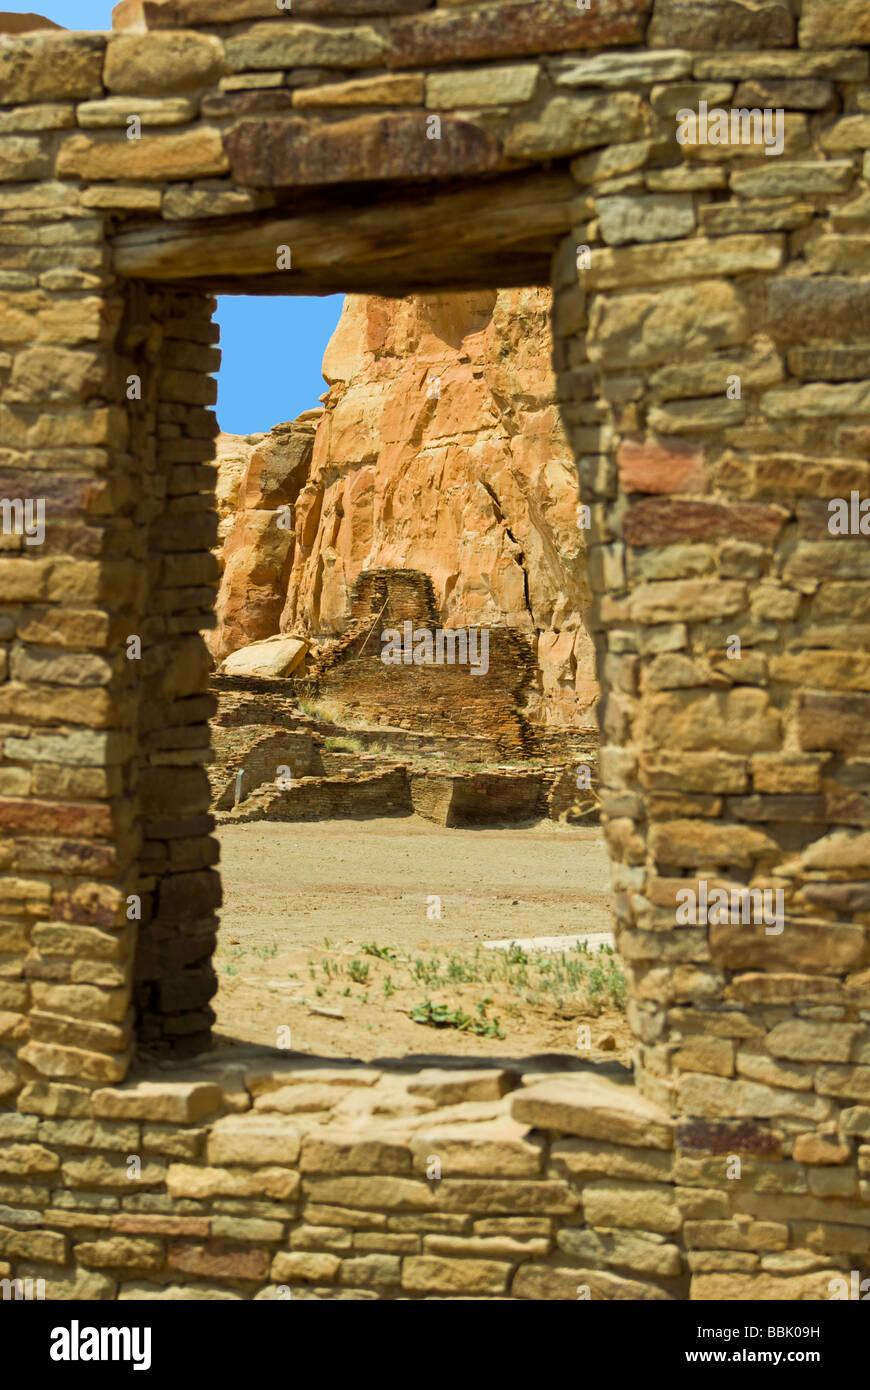 USA New Mexico Chaco Culture National Historical Park Pueblo Bonito remaining walls thru window Stock Photo